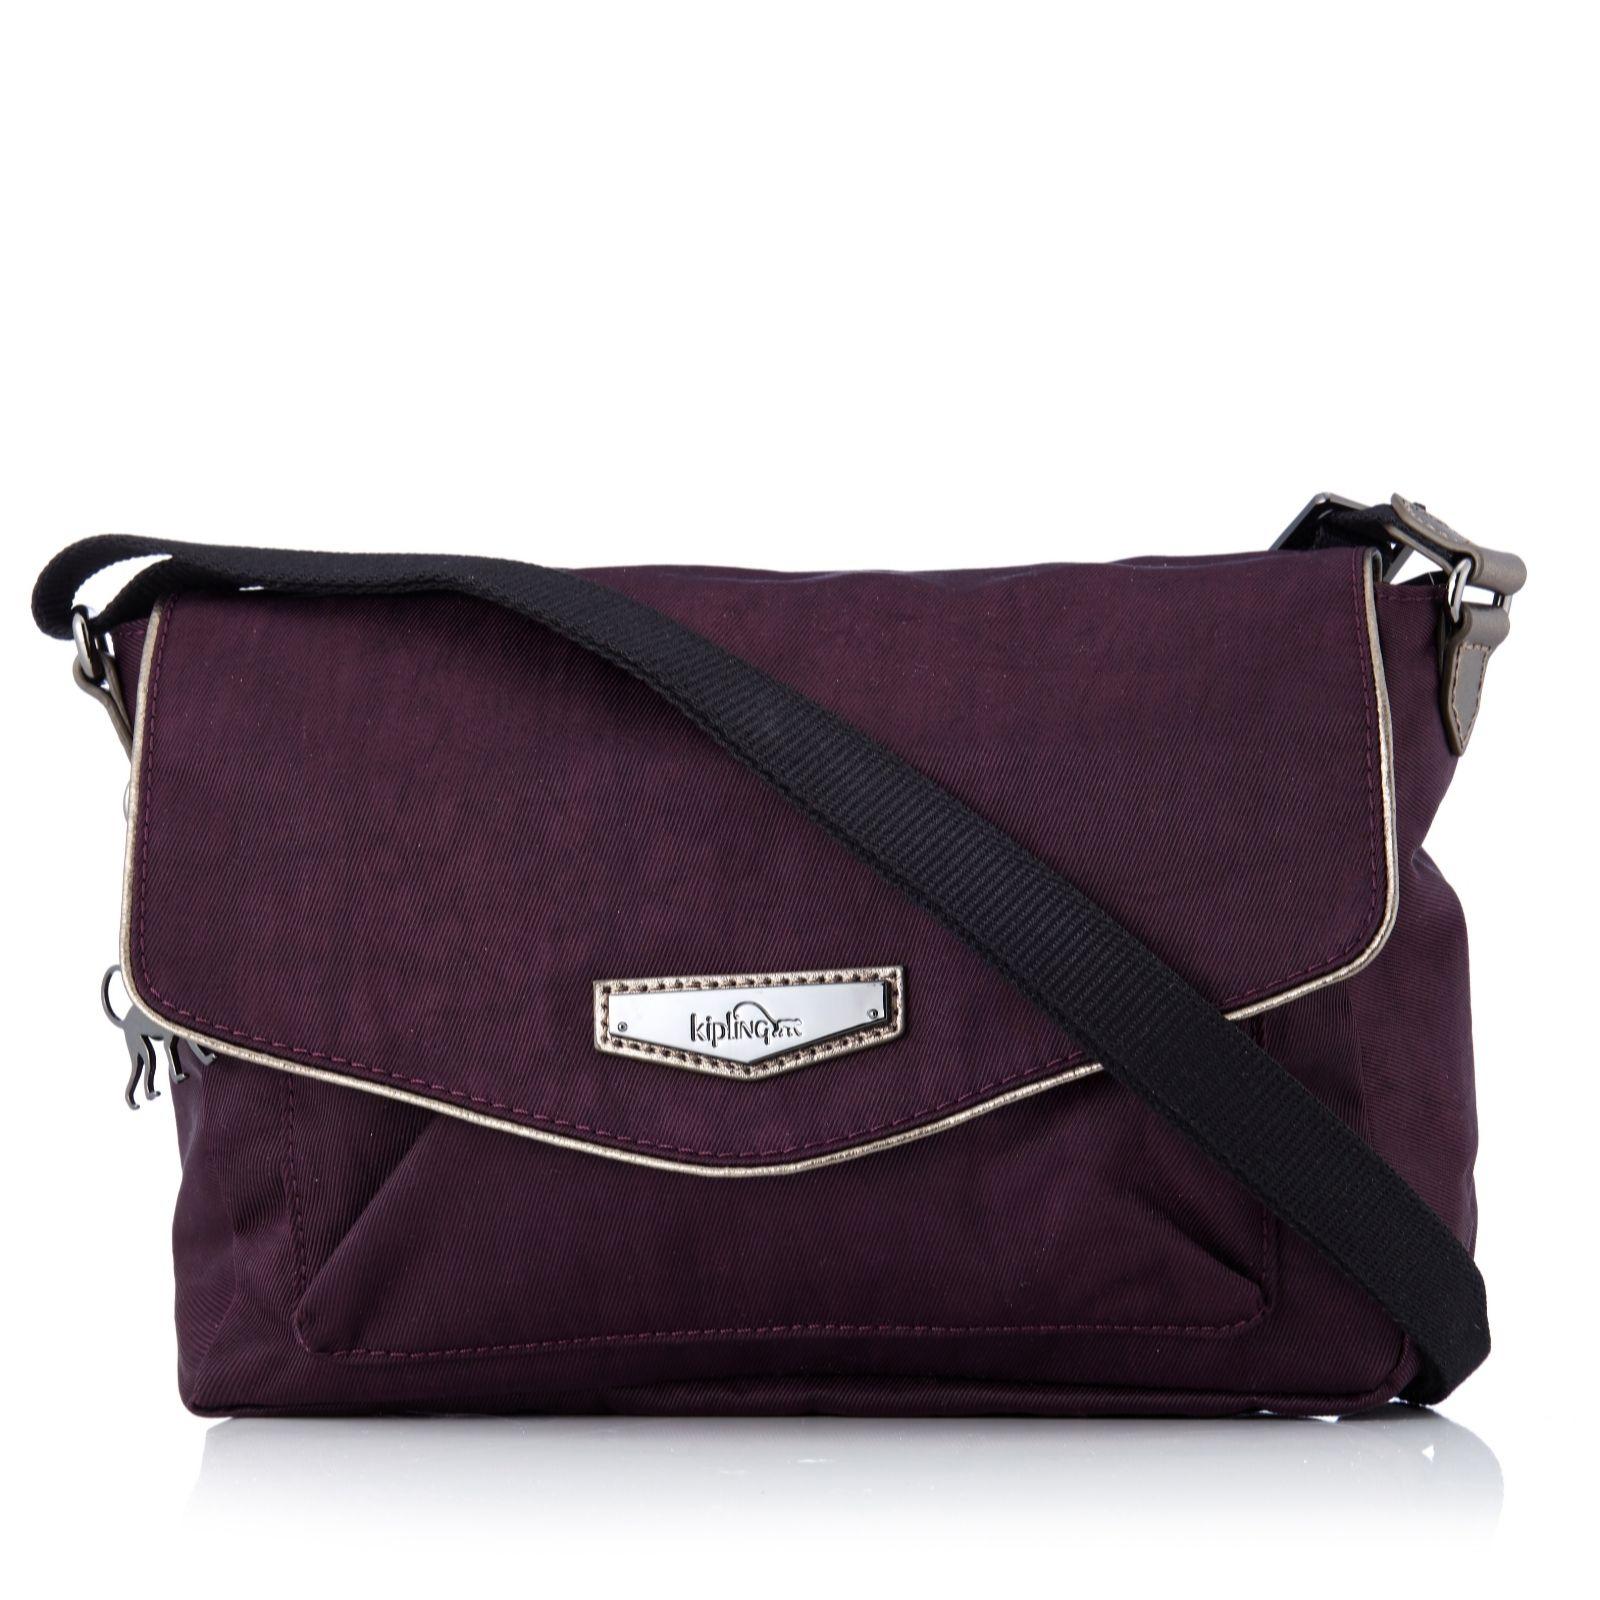 Kipling Handbags Qvc